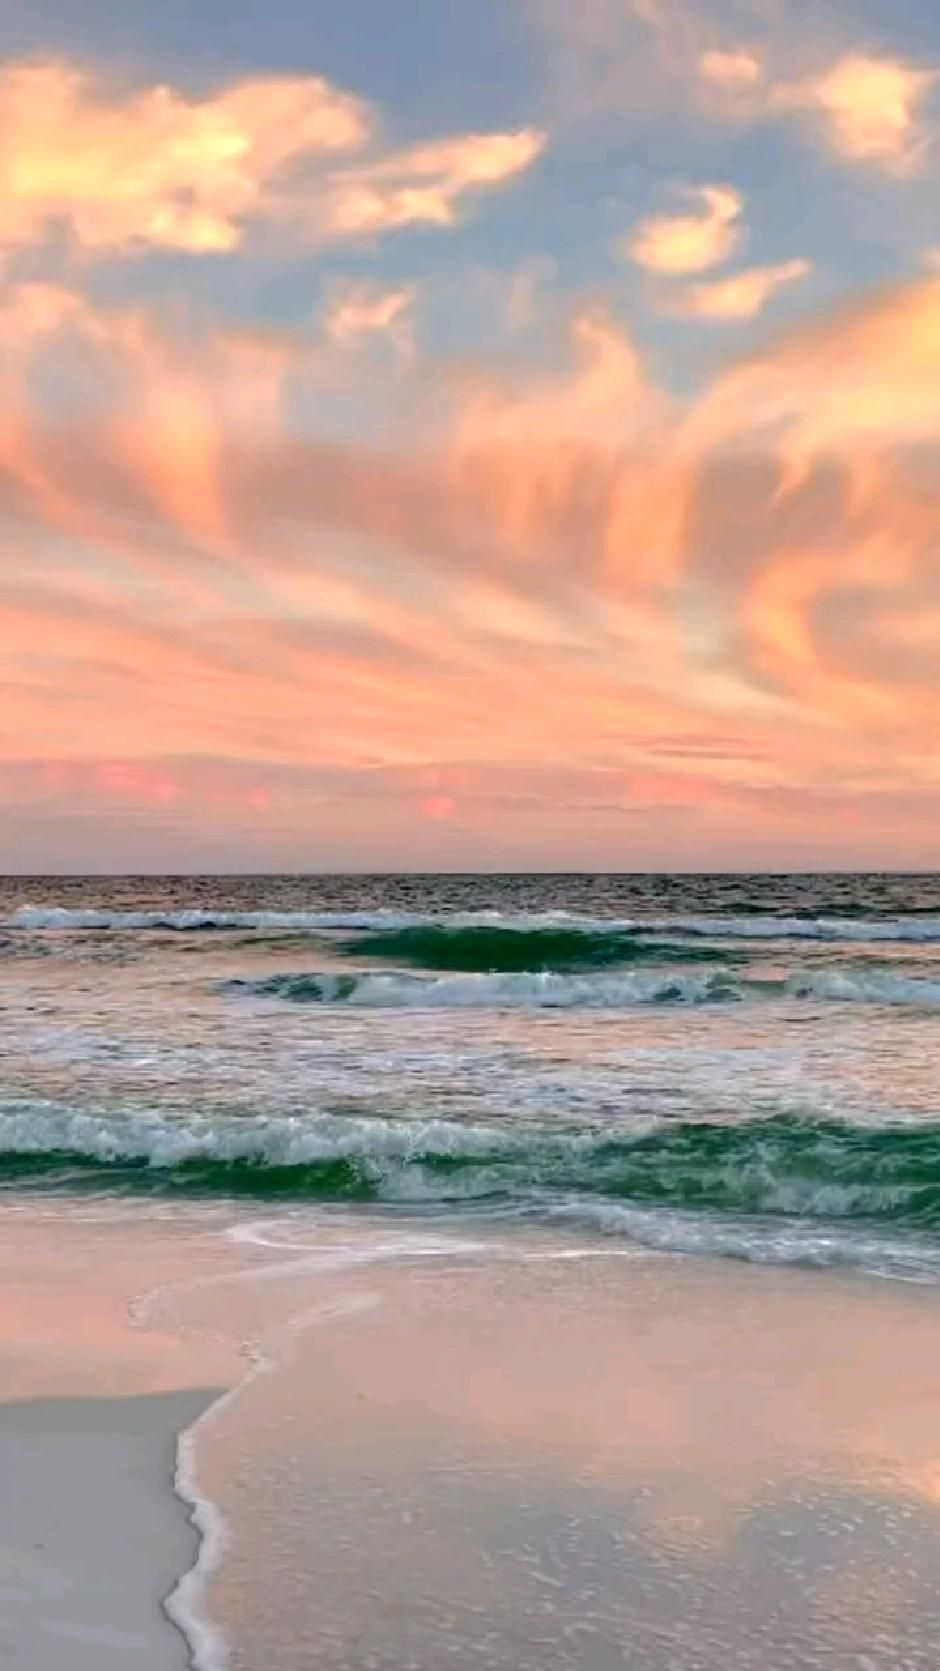 Sunset at the Beach ⛱���